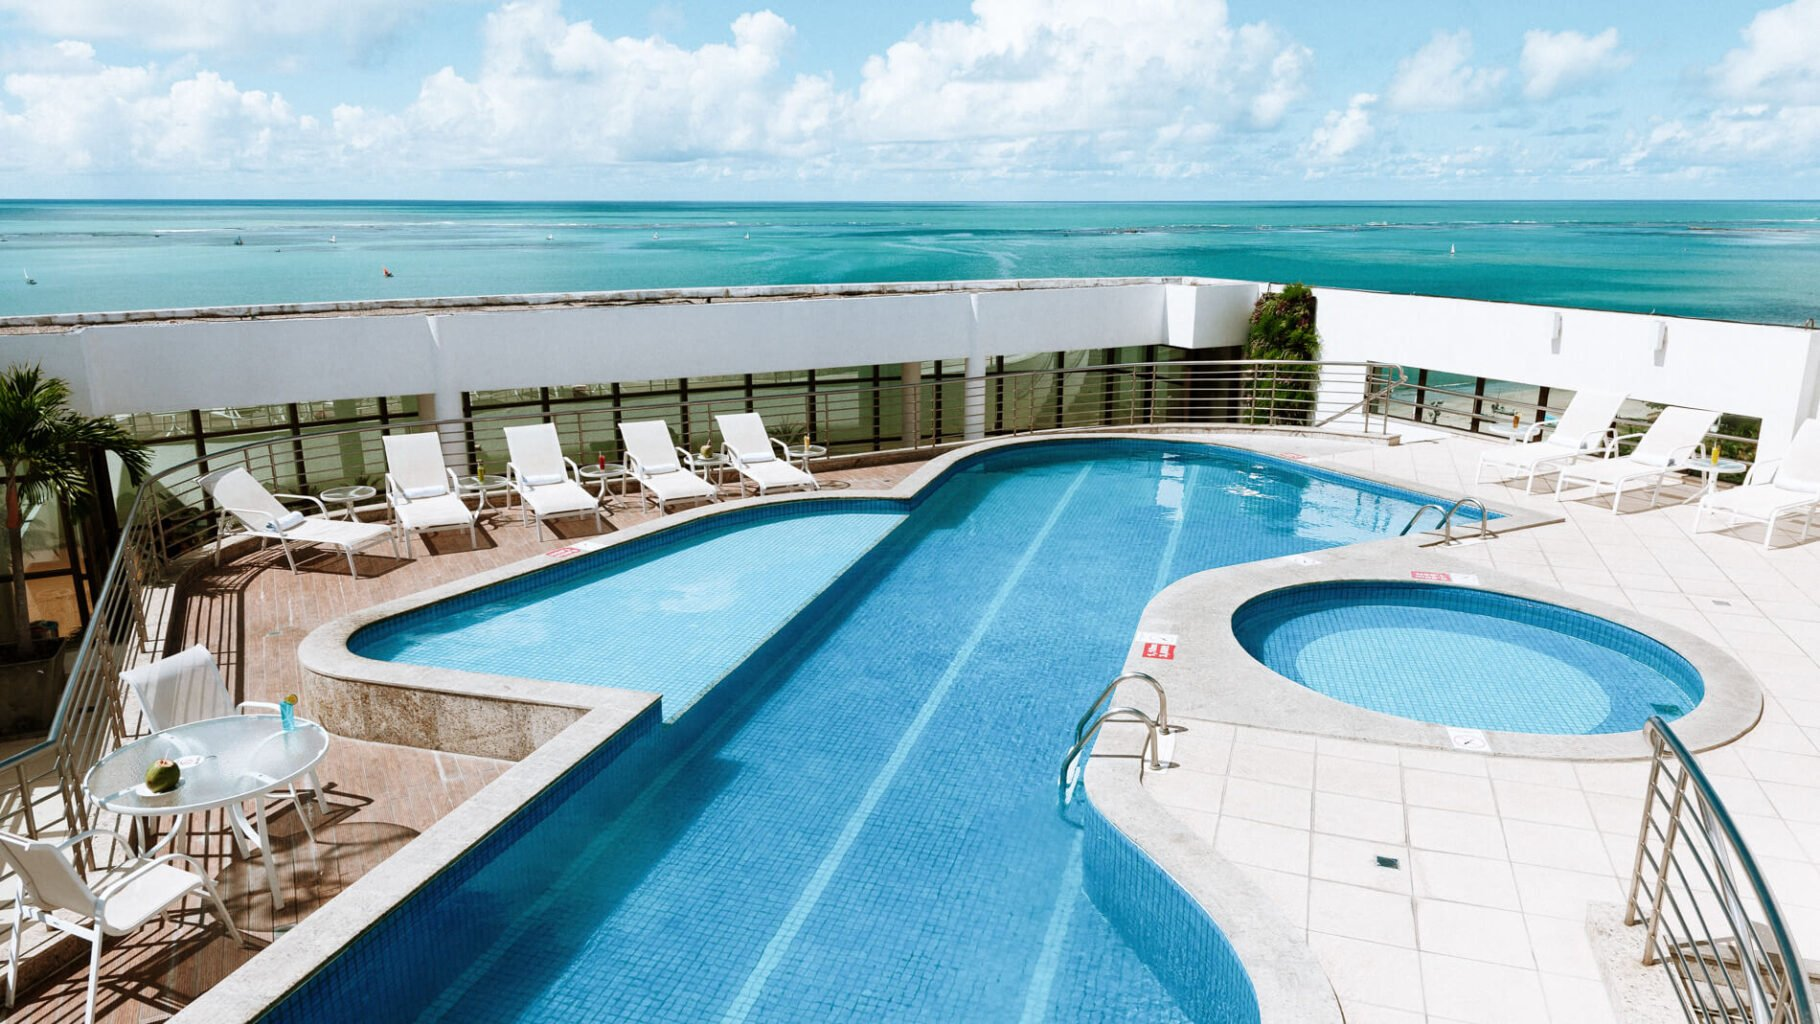 Melhores Hotéis do Brasil TripAdvisor capa